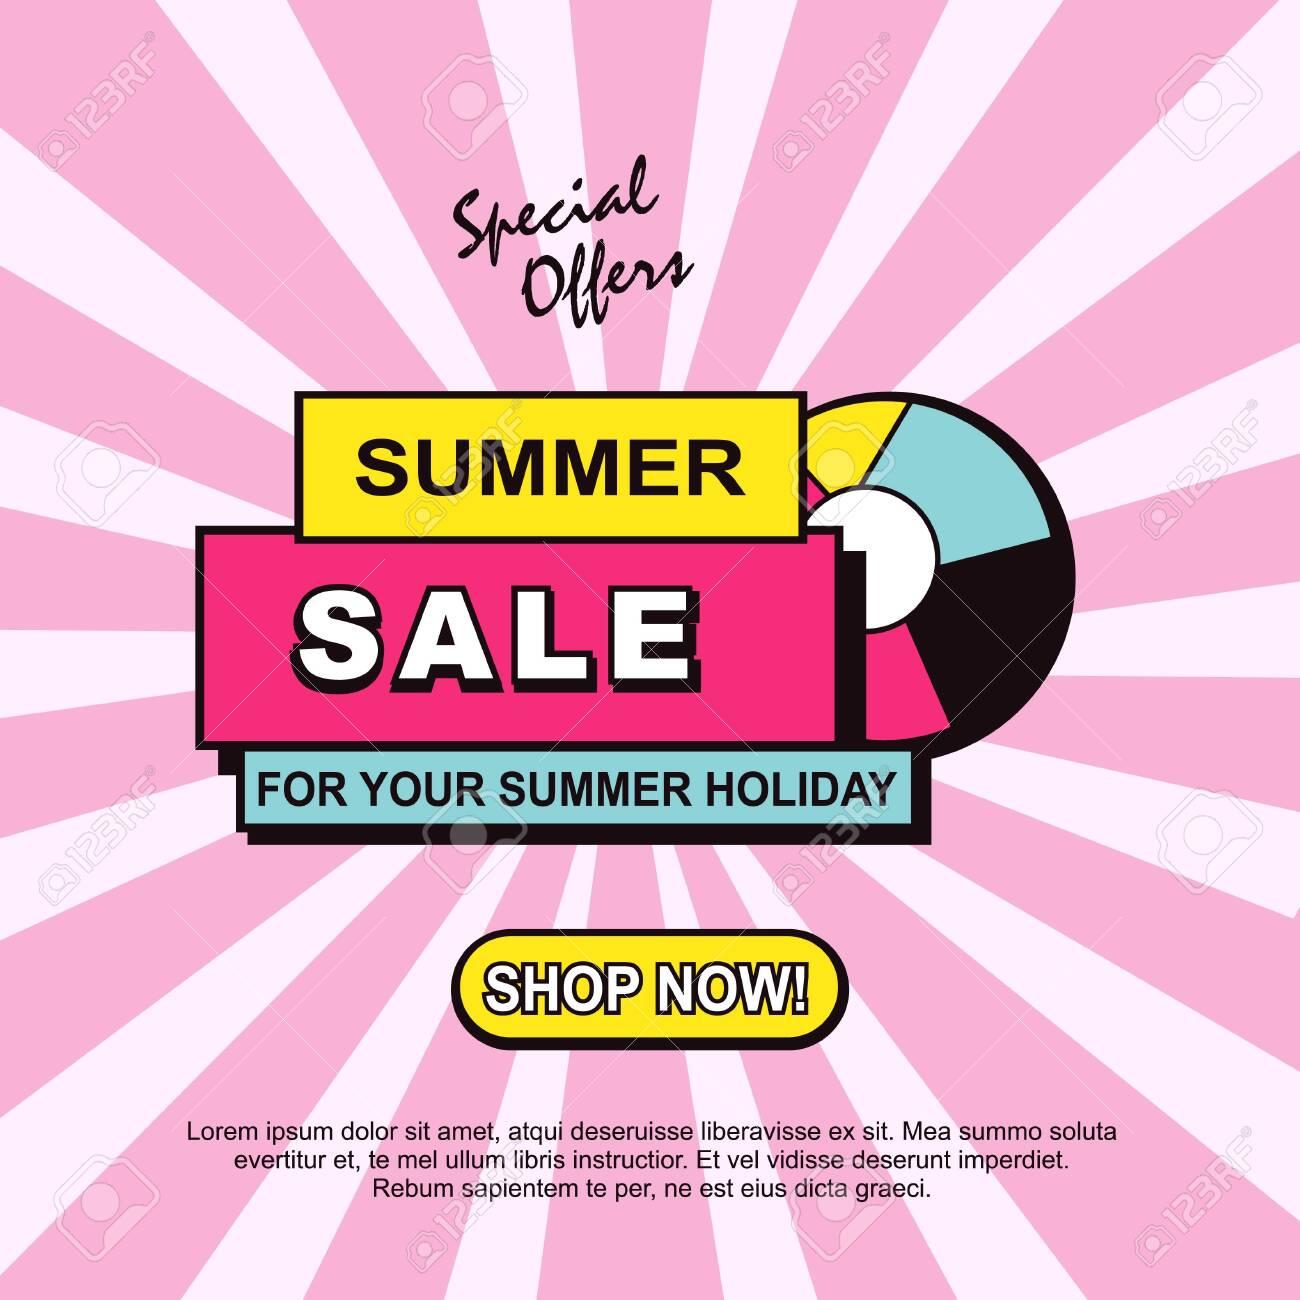 Summer sale discounts banner template design. Sale ads, badge, promotion, promo, card, poster, flyer. - 129101300